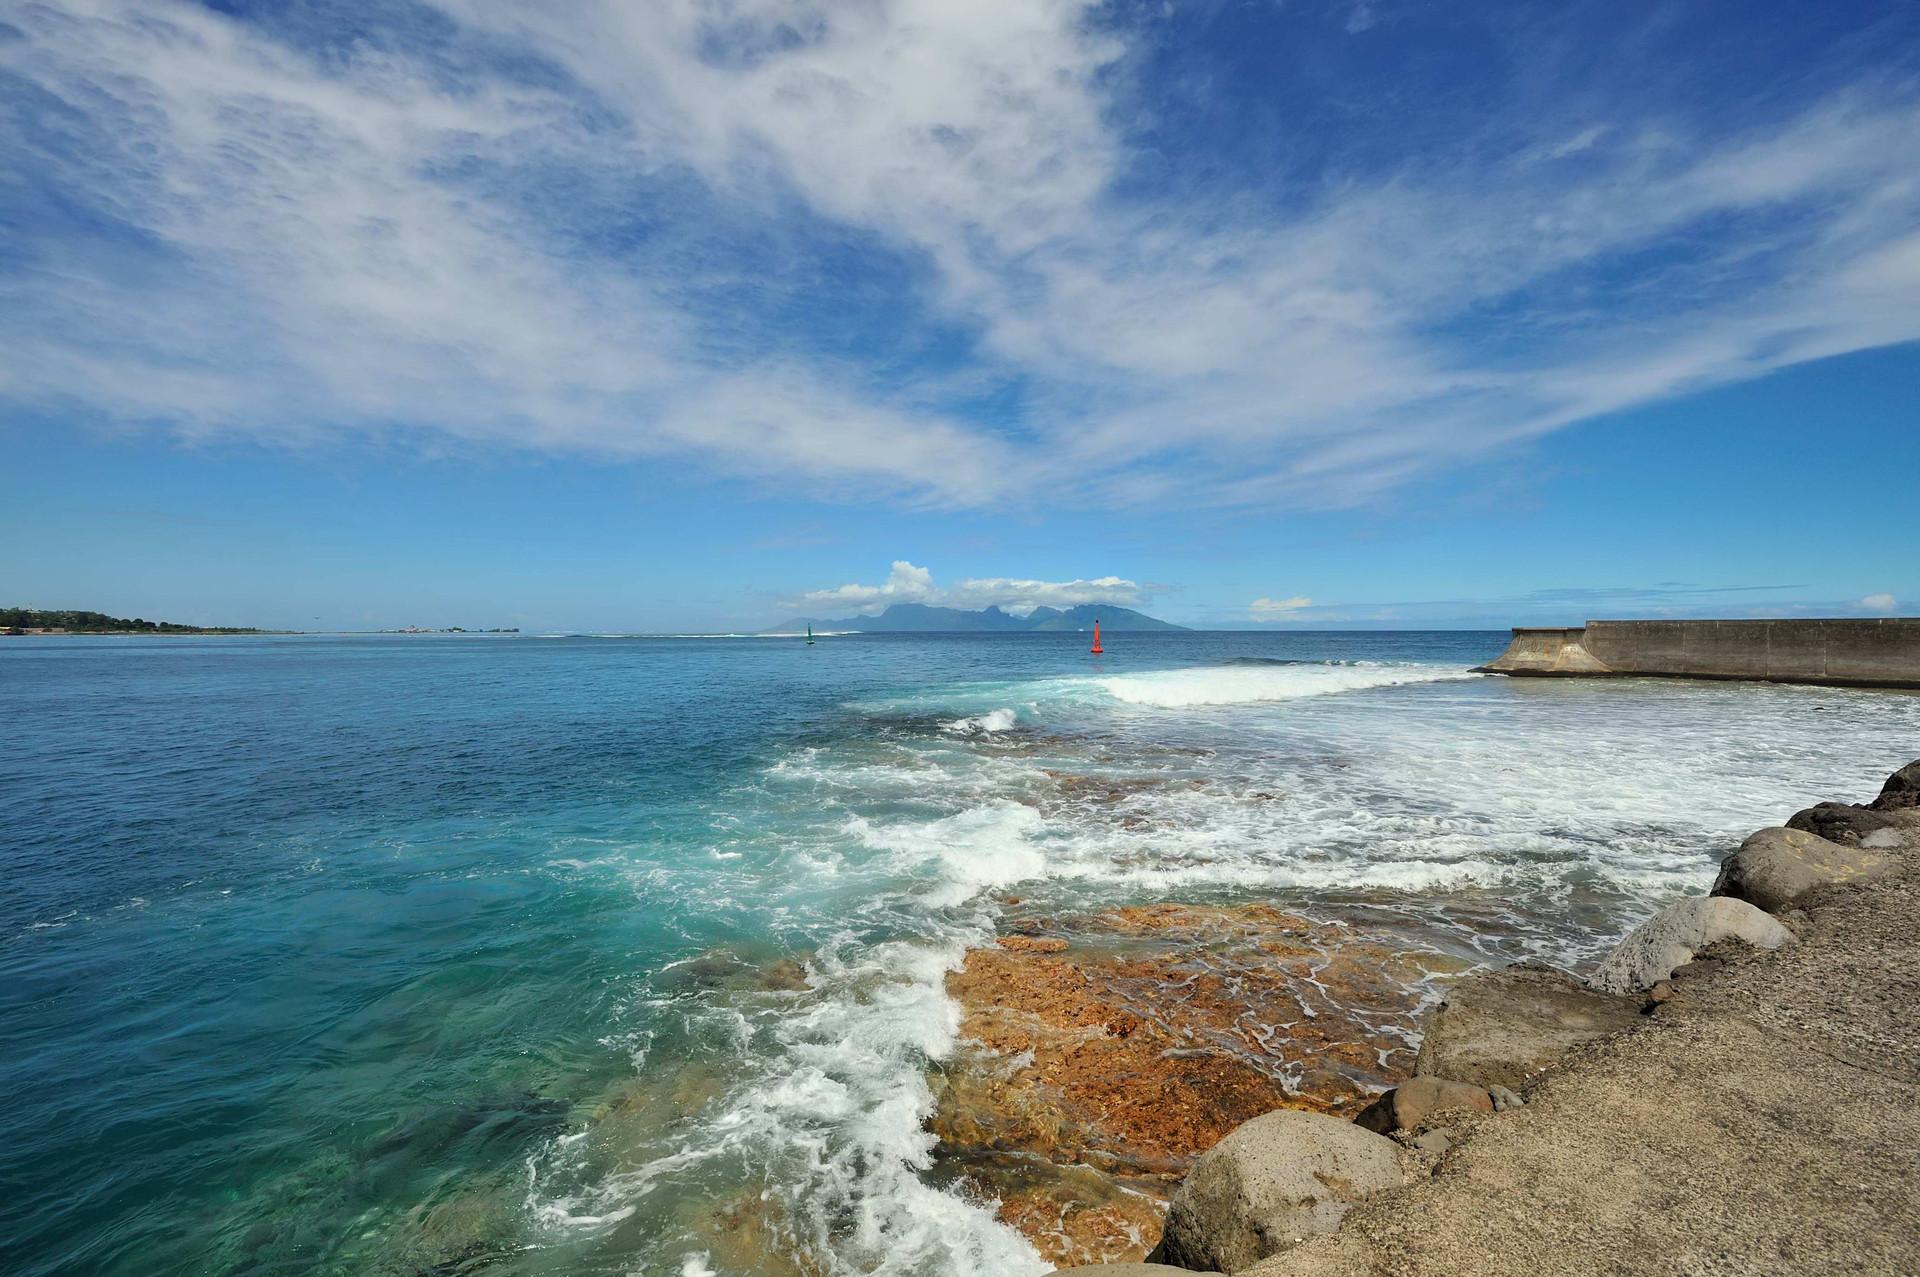 Papeete, Tahiti breakwater looking at Moorea